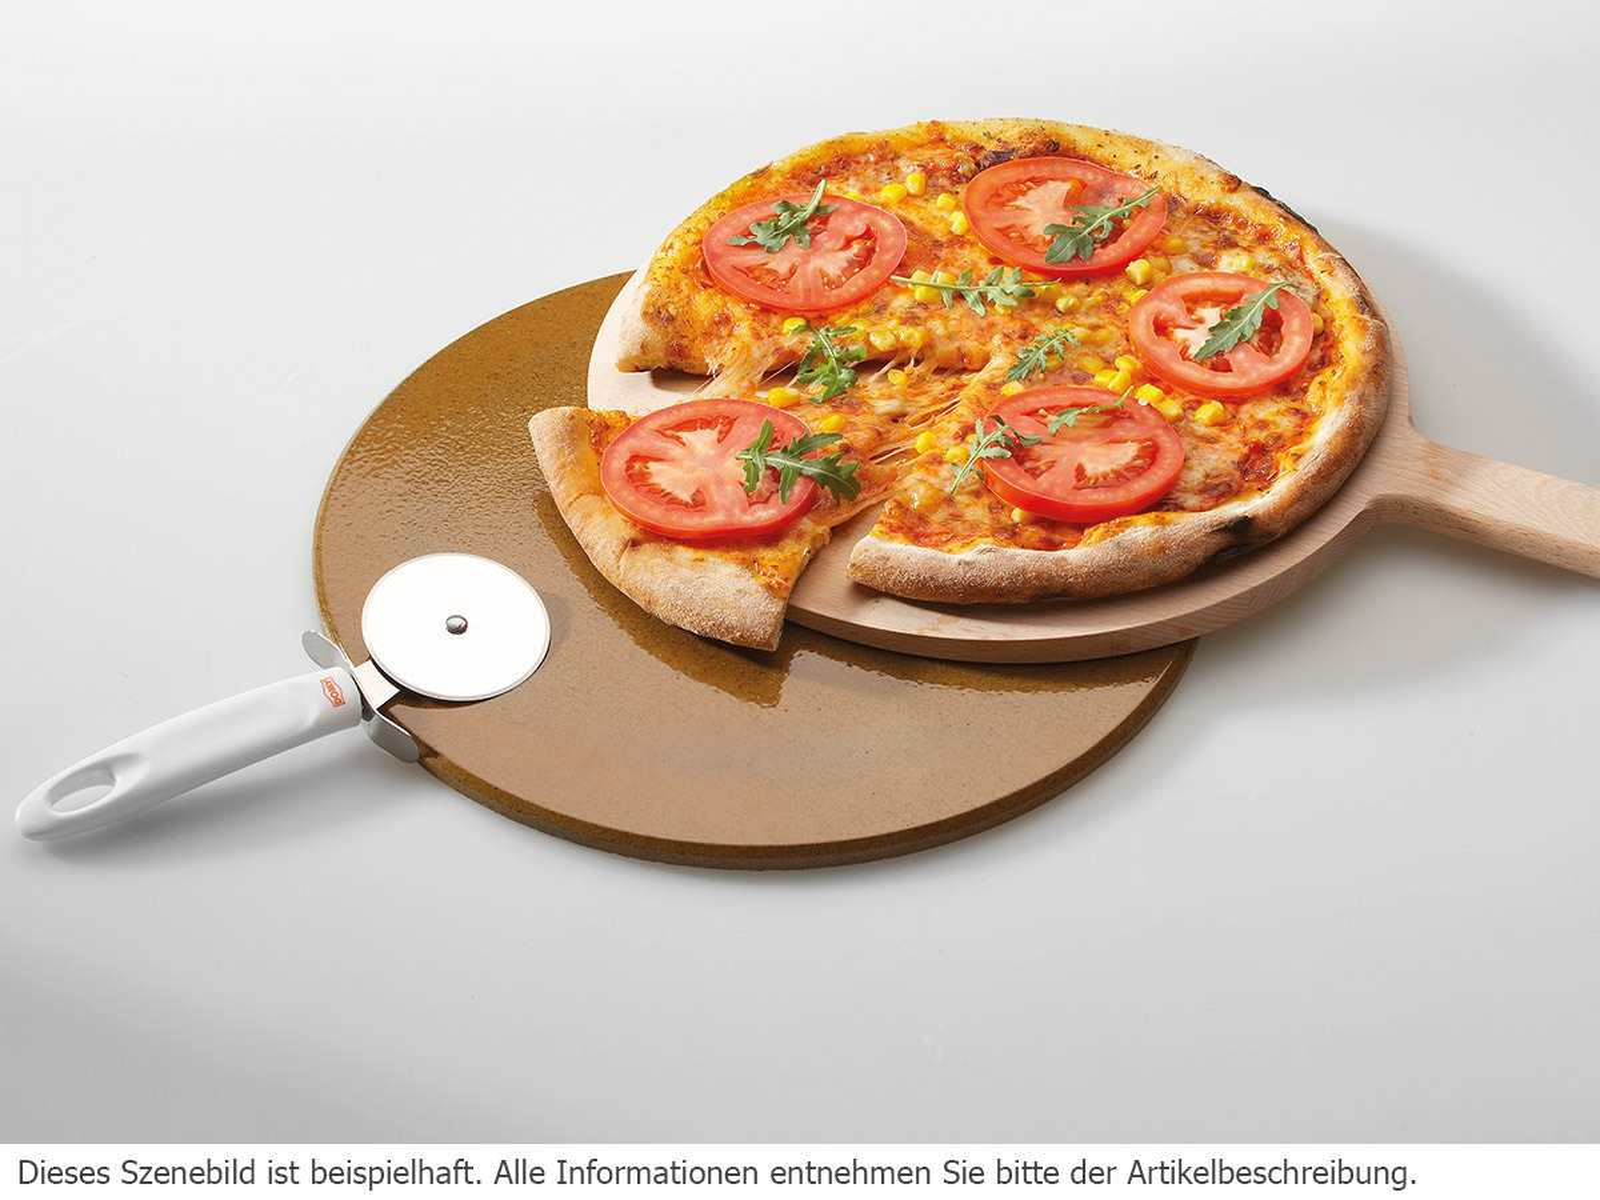 Gorenje 116814 Pizza-Set